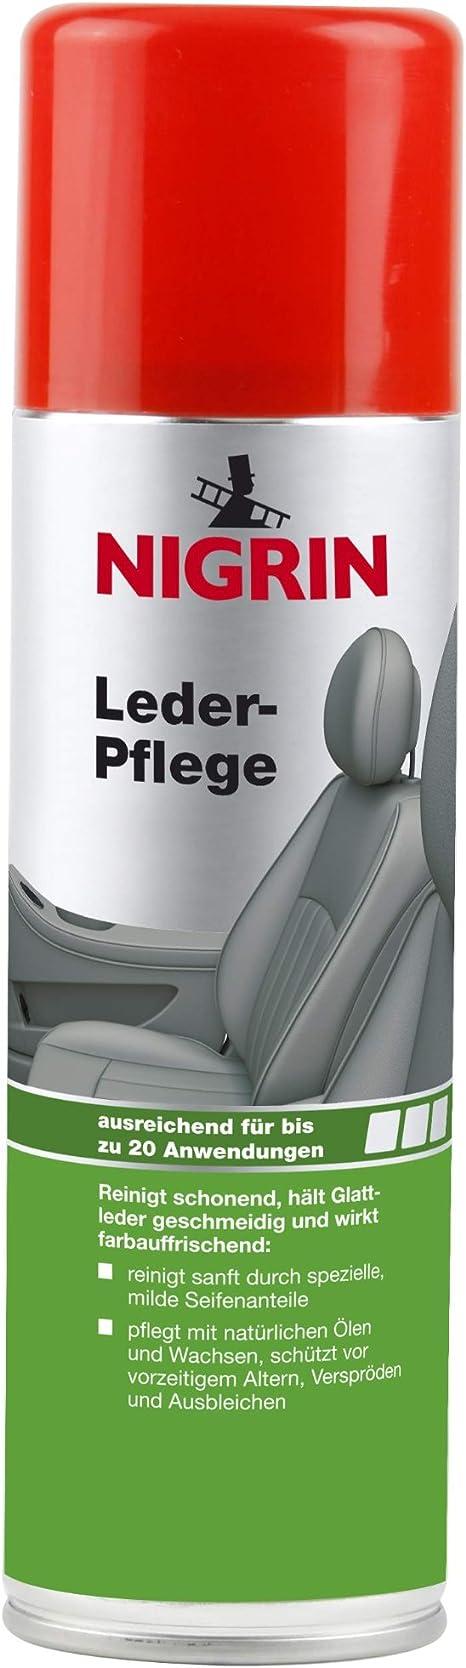 Nigrin 74594 Leder Pflege 400 Ml Auto